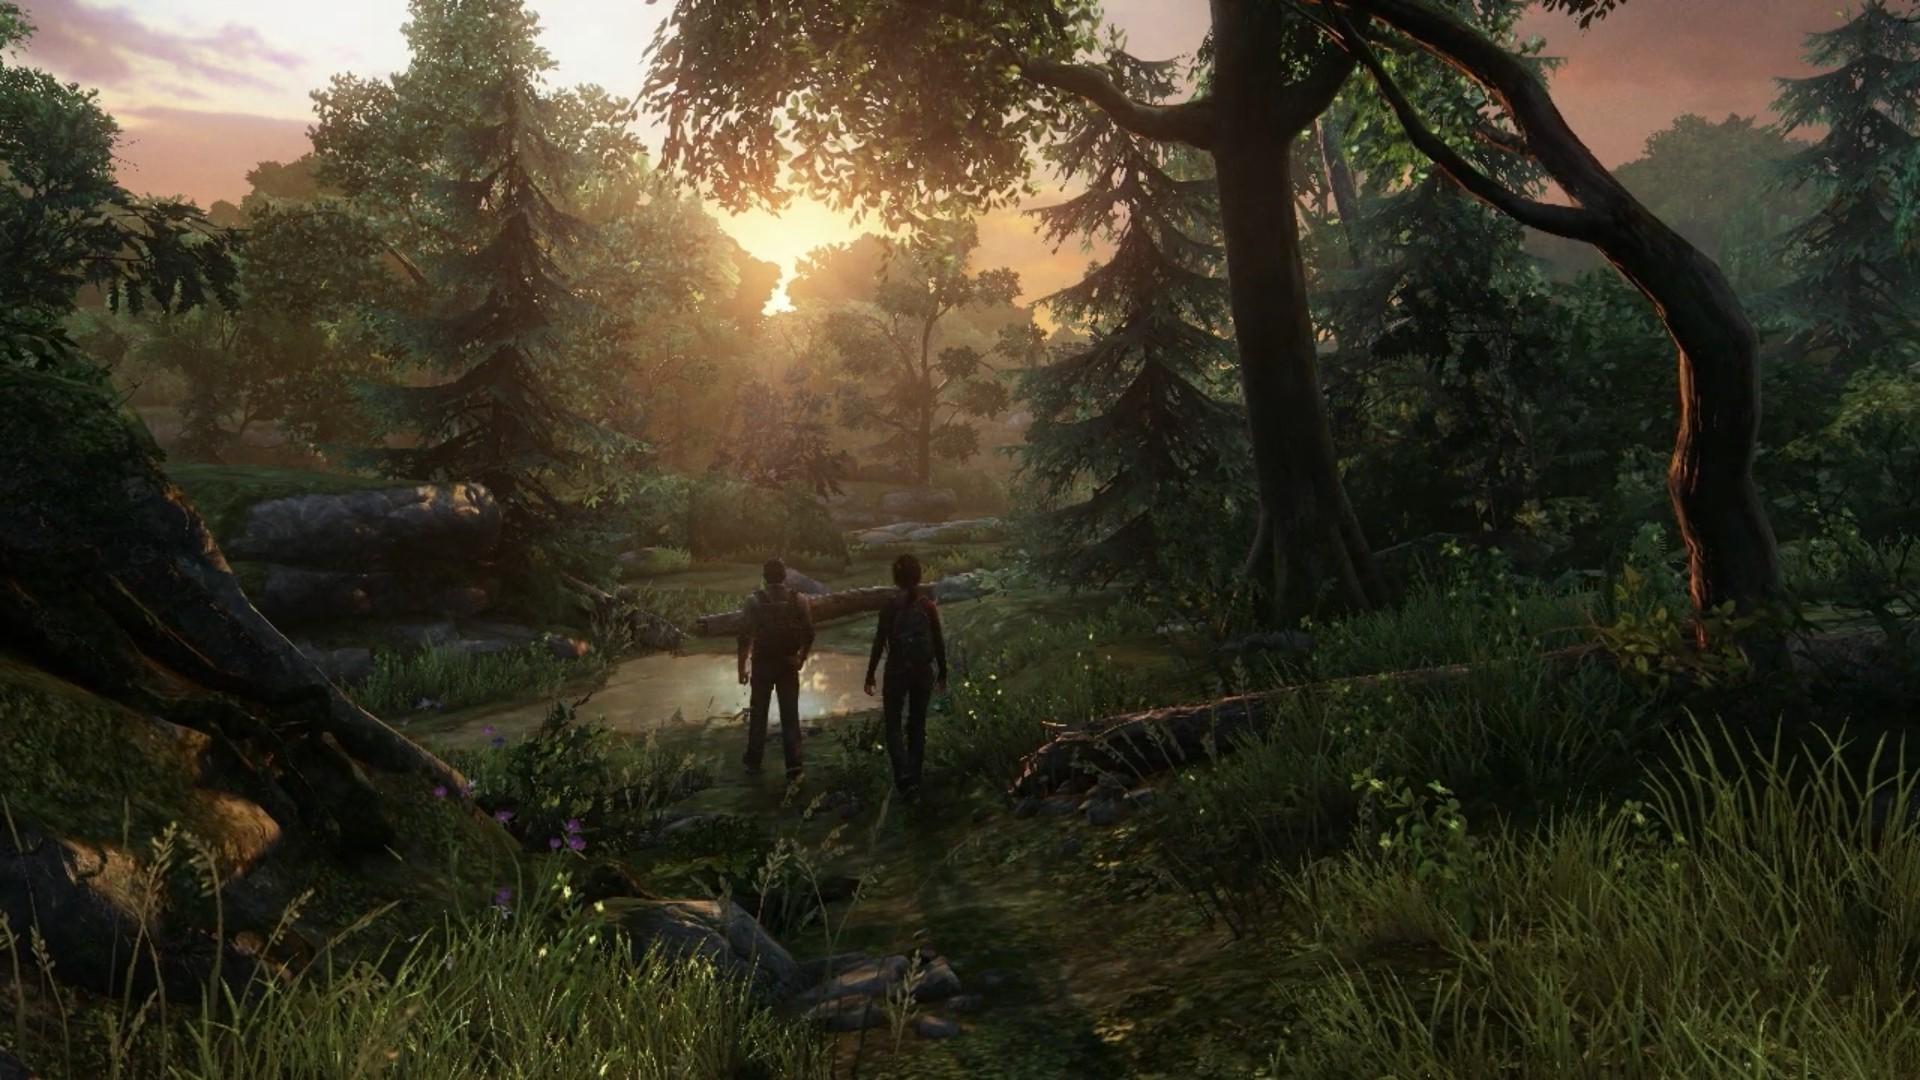 Joel and Ellie   The Last of Us wallpaper   1024069 1920x1080